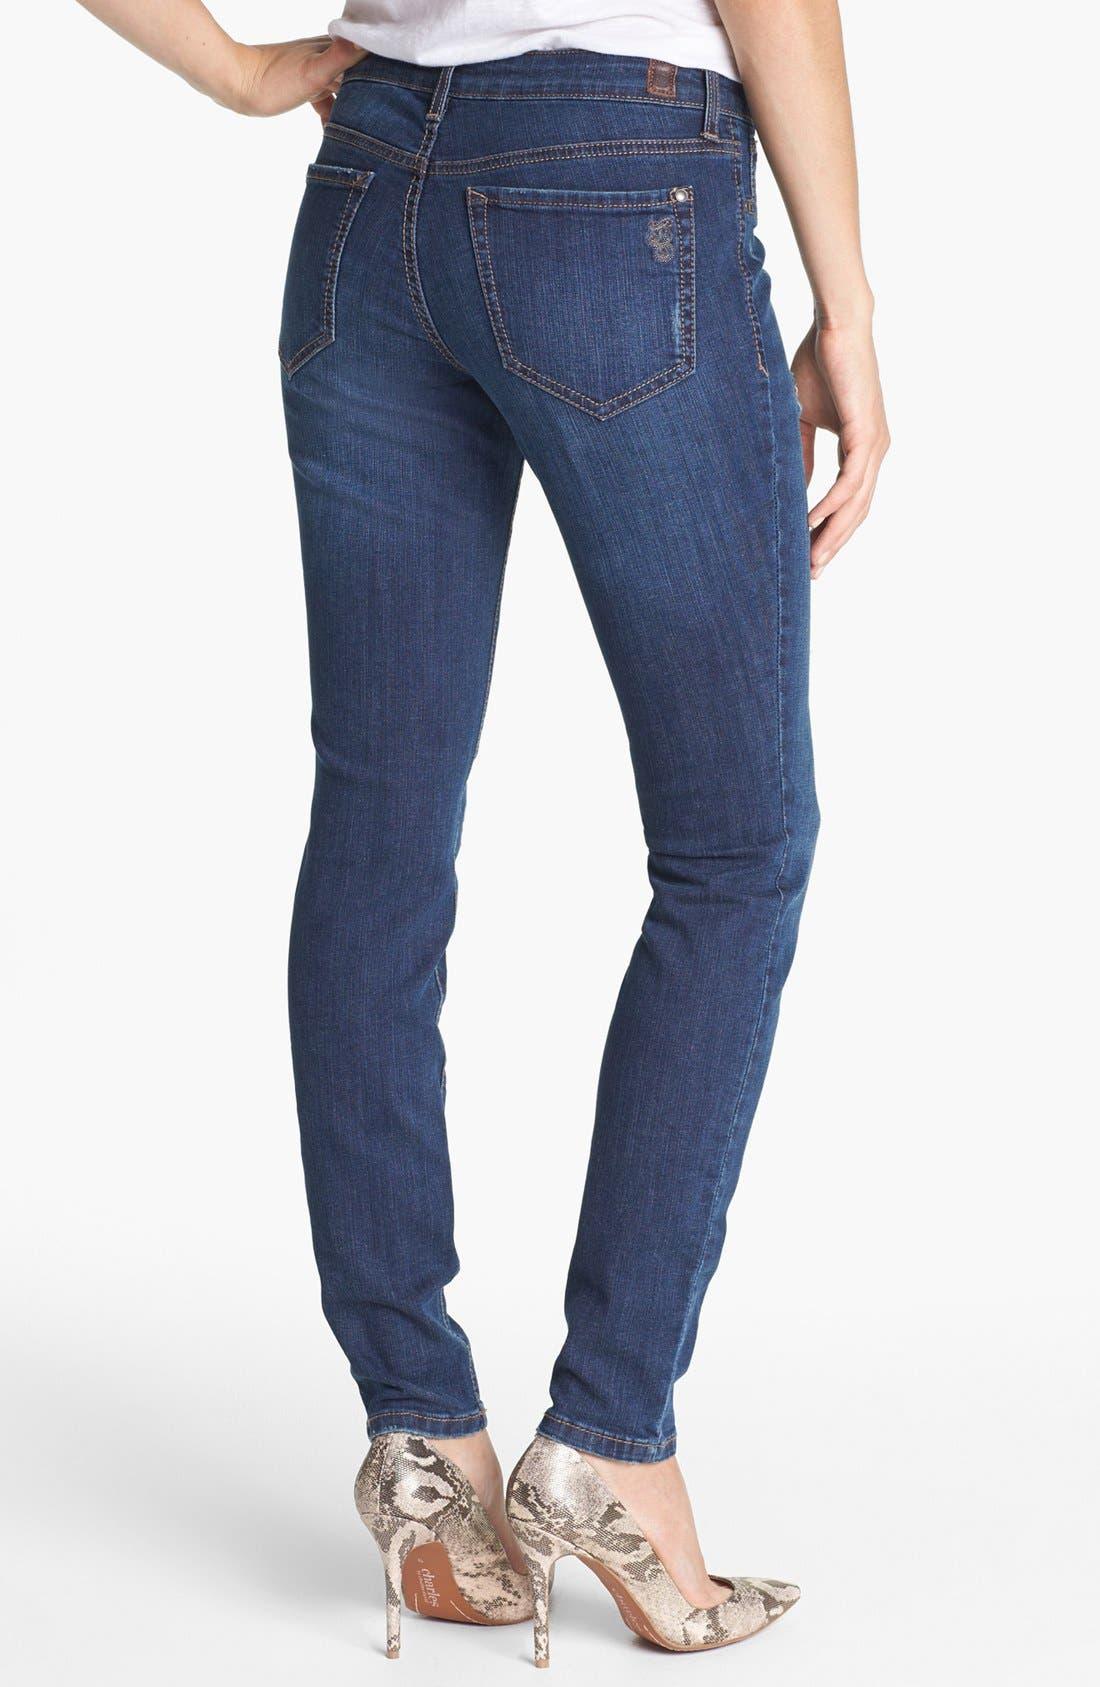 Alternate Image 2  - Jessica Simpson 'Kiss Me' Deconstructed Skinny Jeans (Bing Bang)